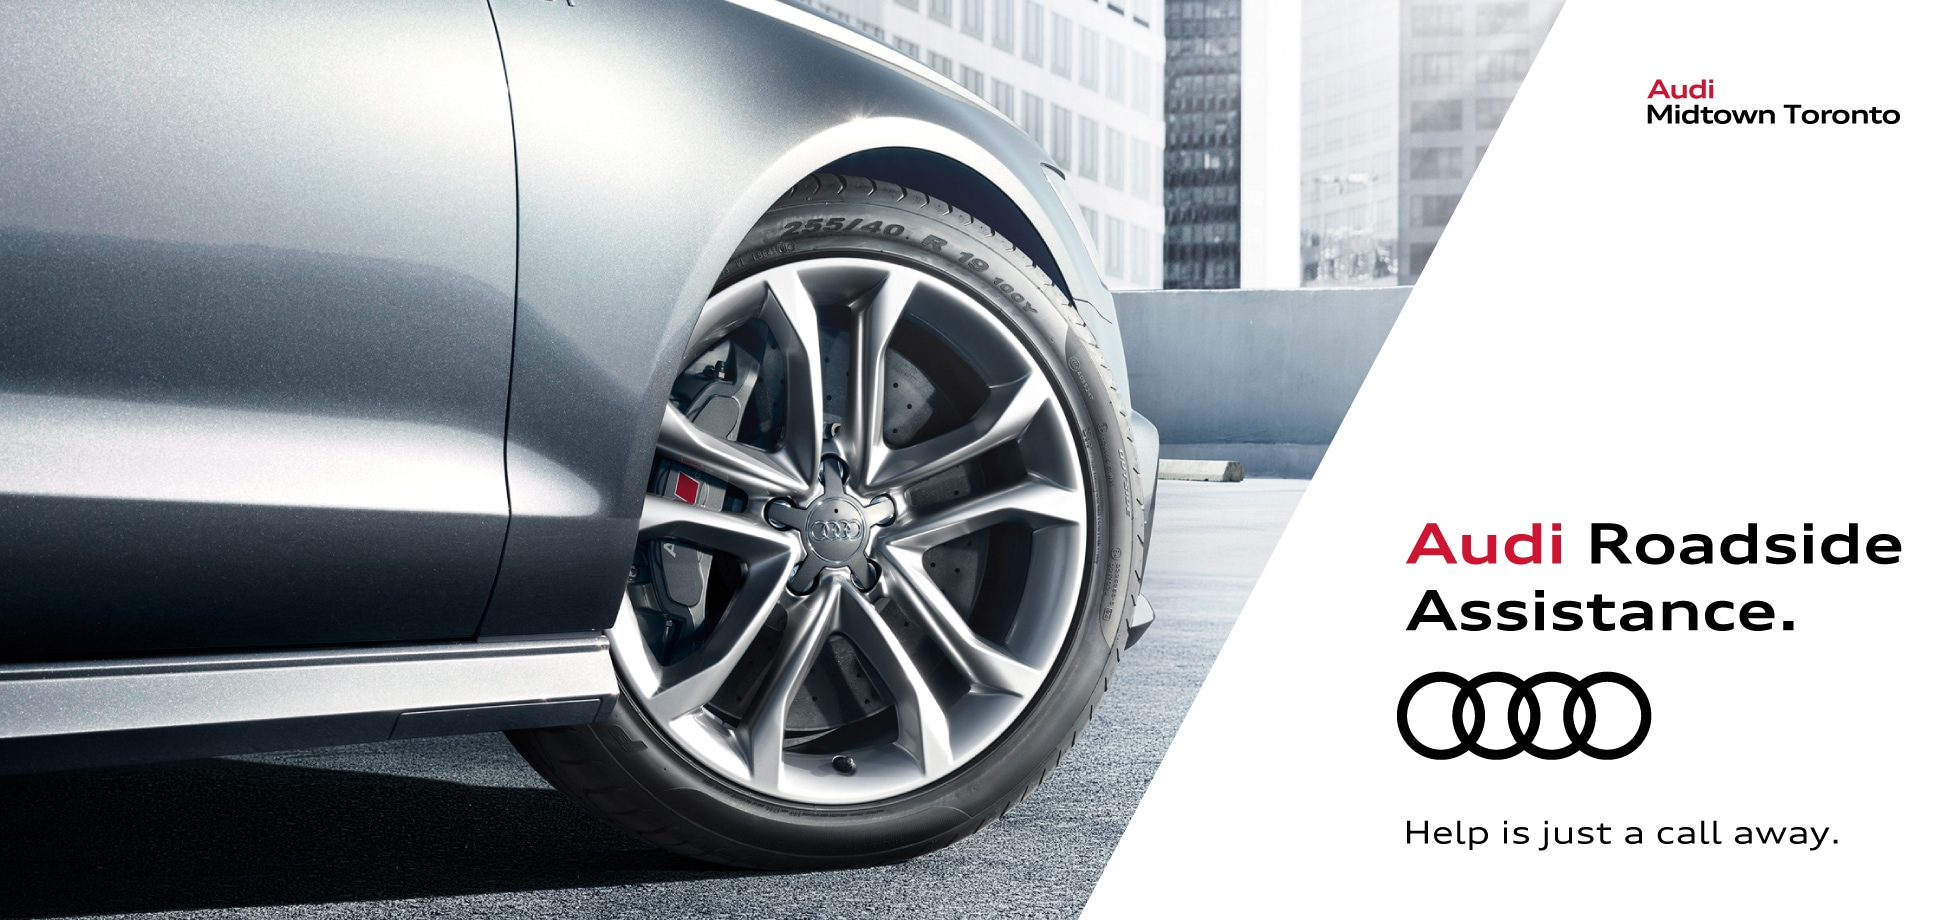 Audi Midtown Toronto New Audi Dealership In Toronto ON MJ R - Audi roadside assistance